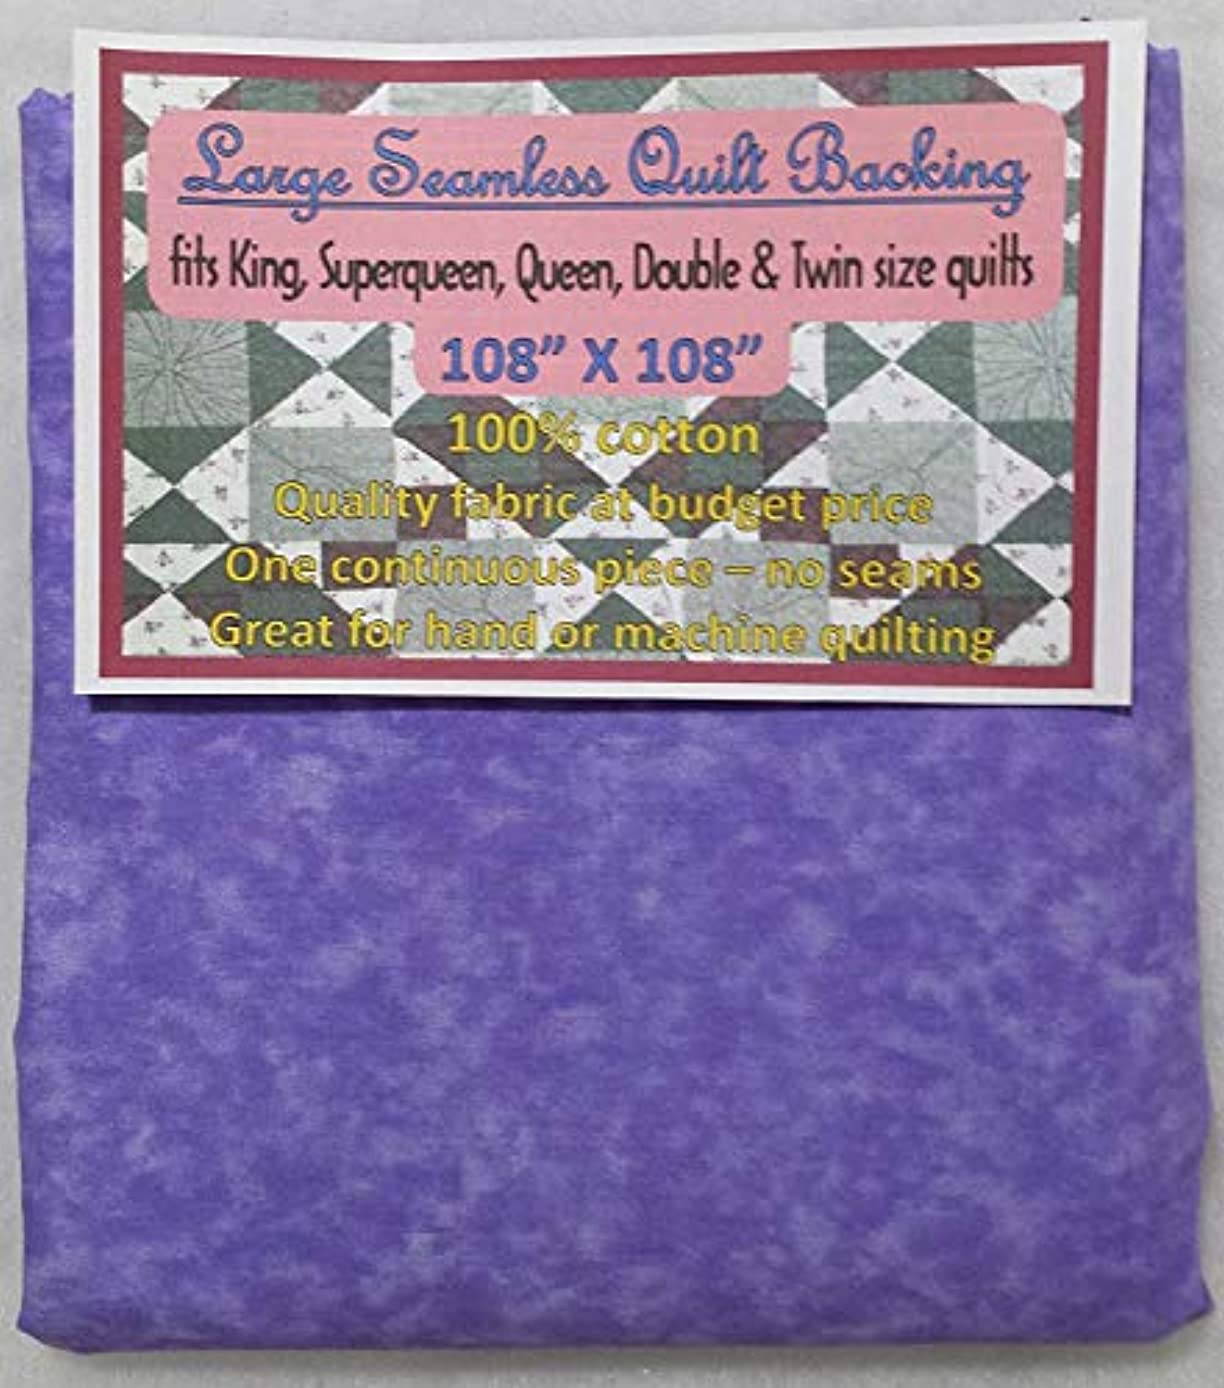 Quilt Backing, Large, Seamless, C44395-403, Light Purple